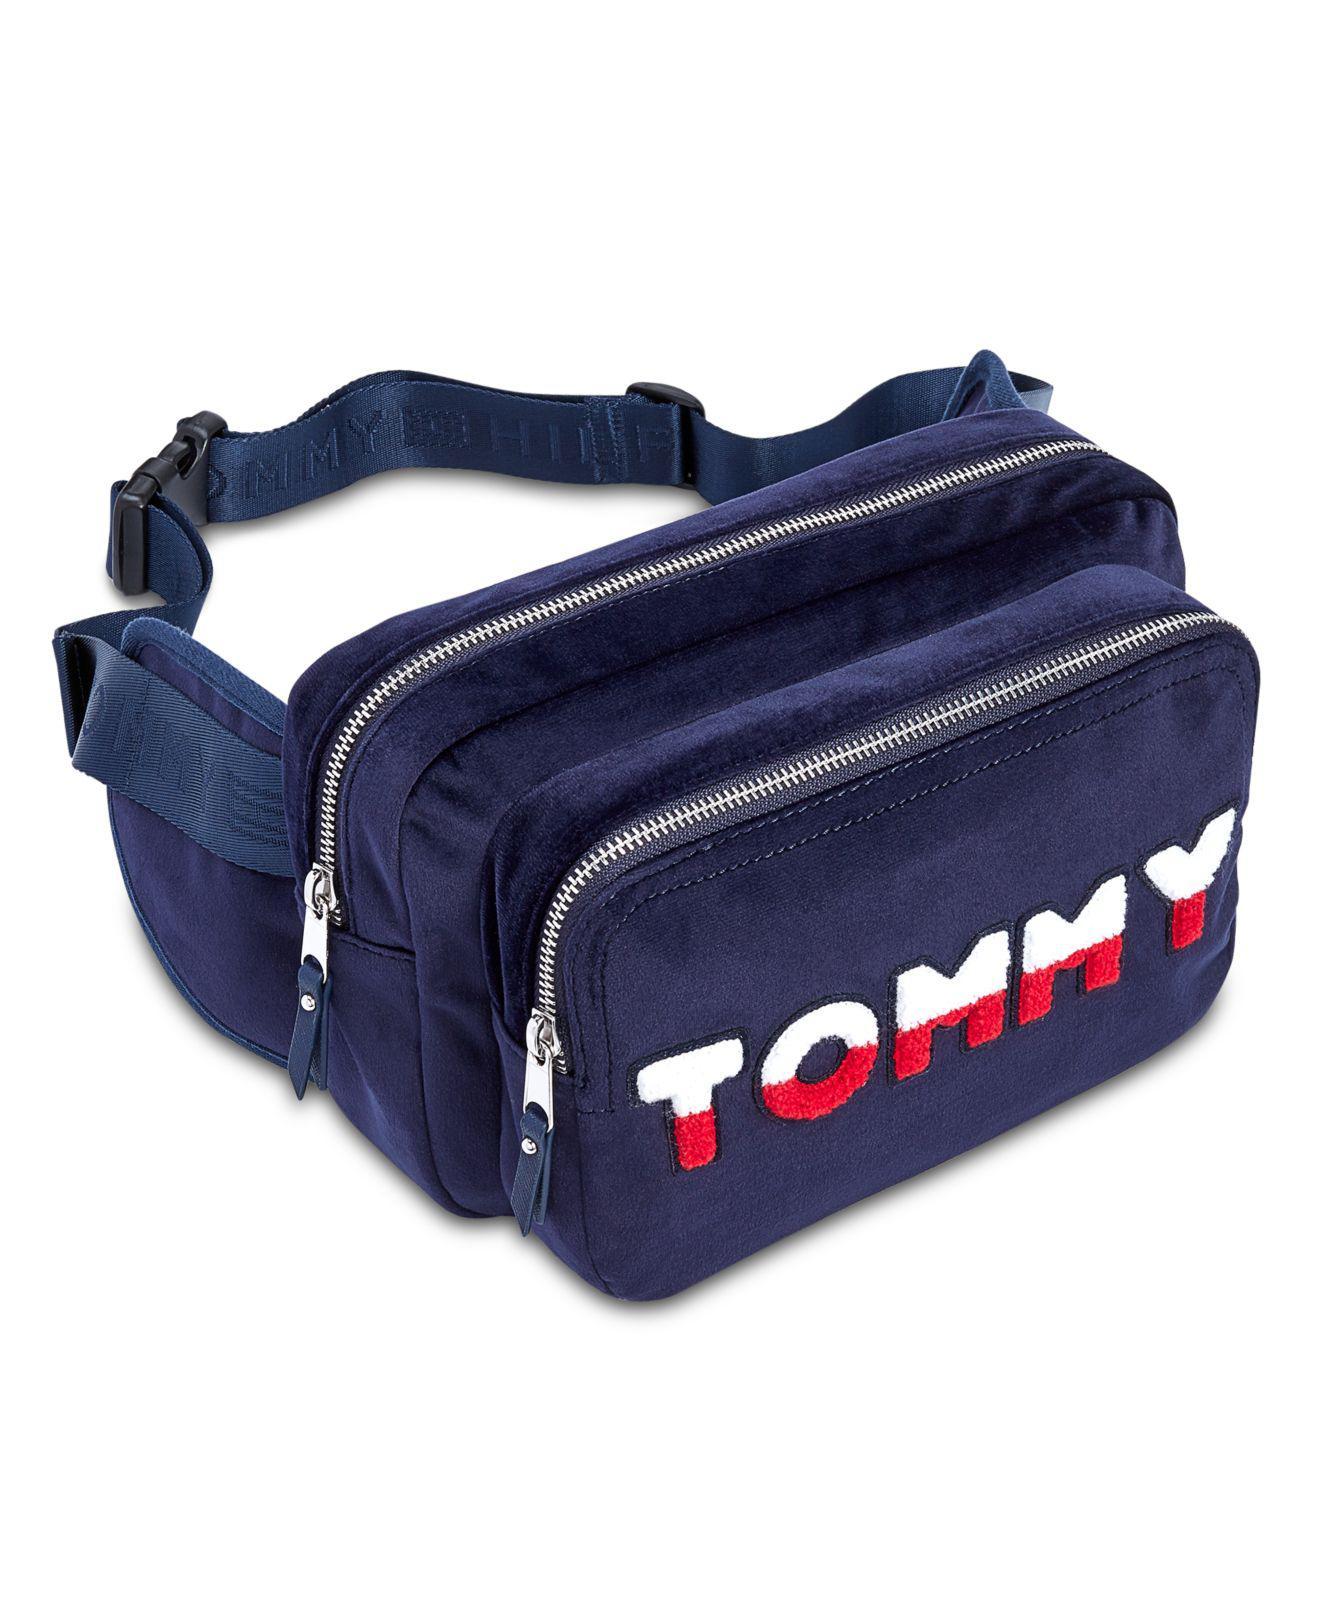 63aa83dc Tommy Hilfiger Tommy Velvet Convertible Belt Bag in Blue - Lyst